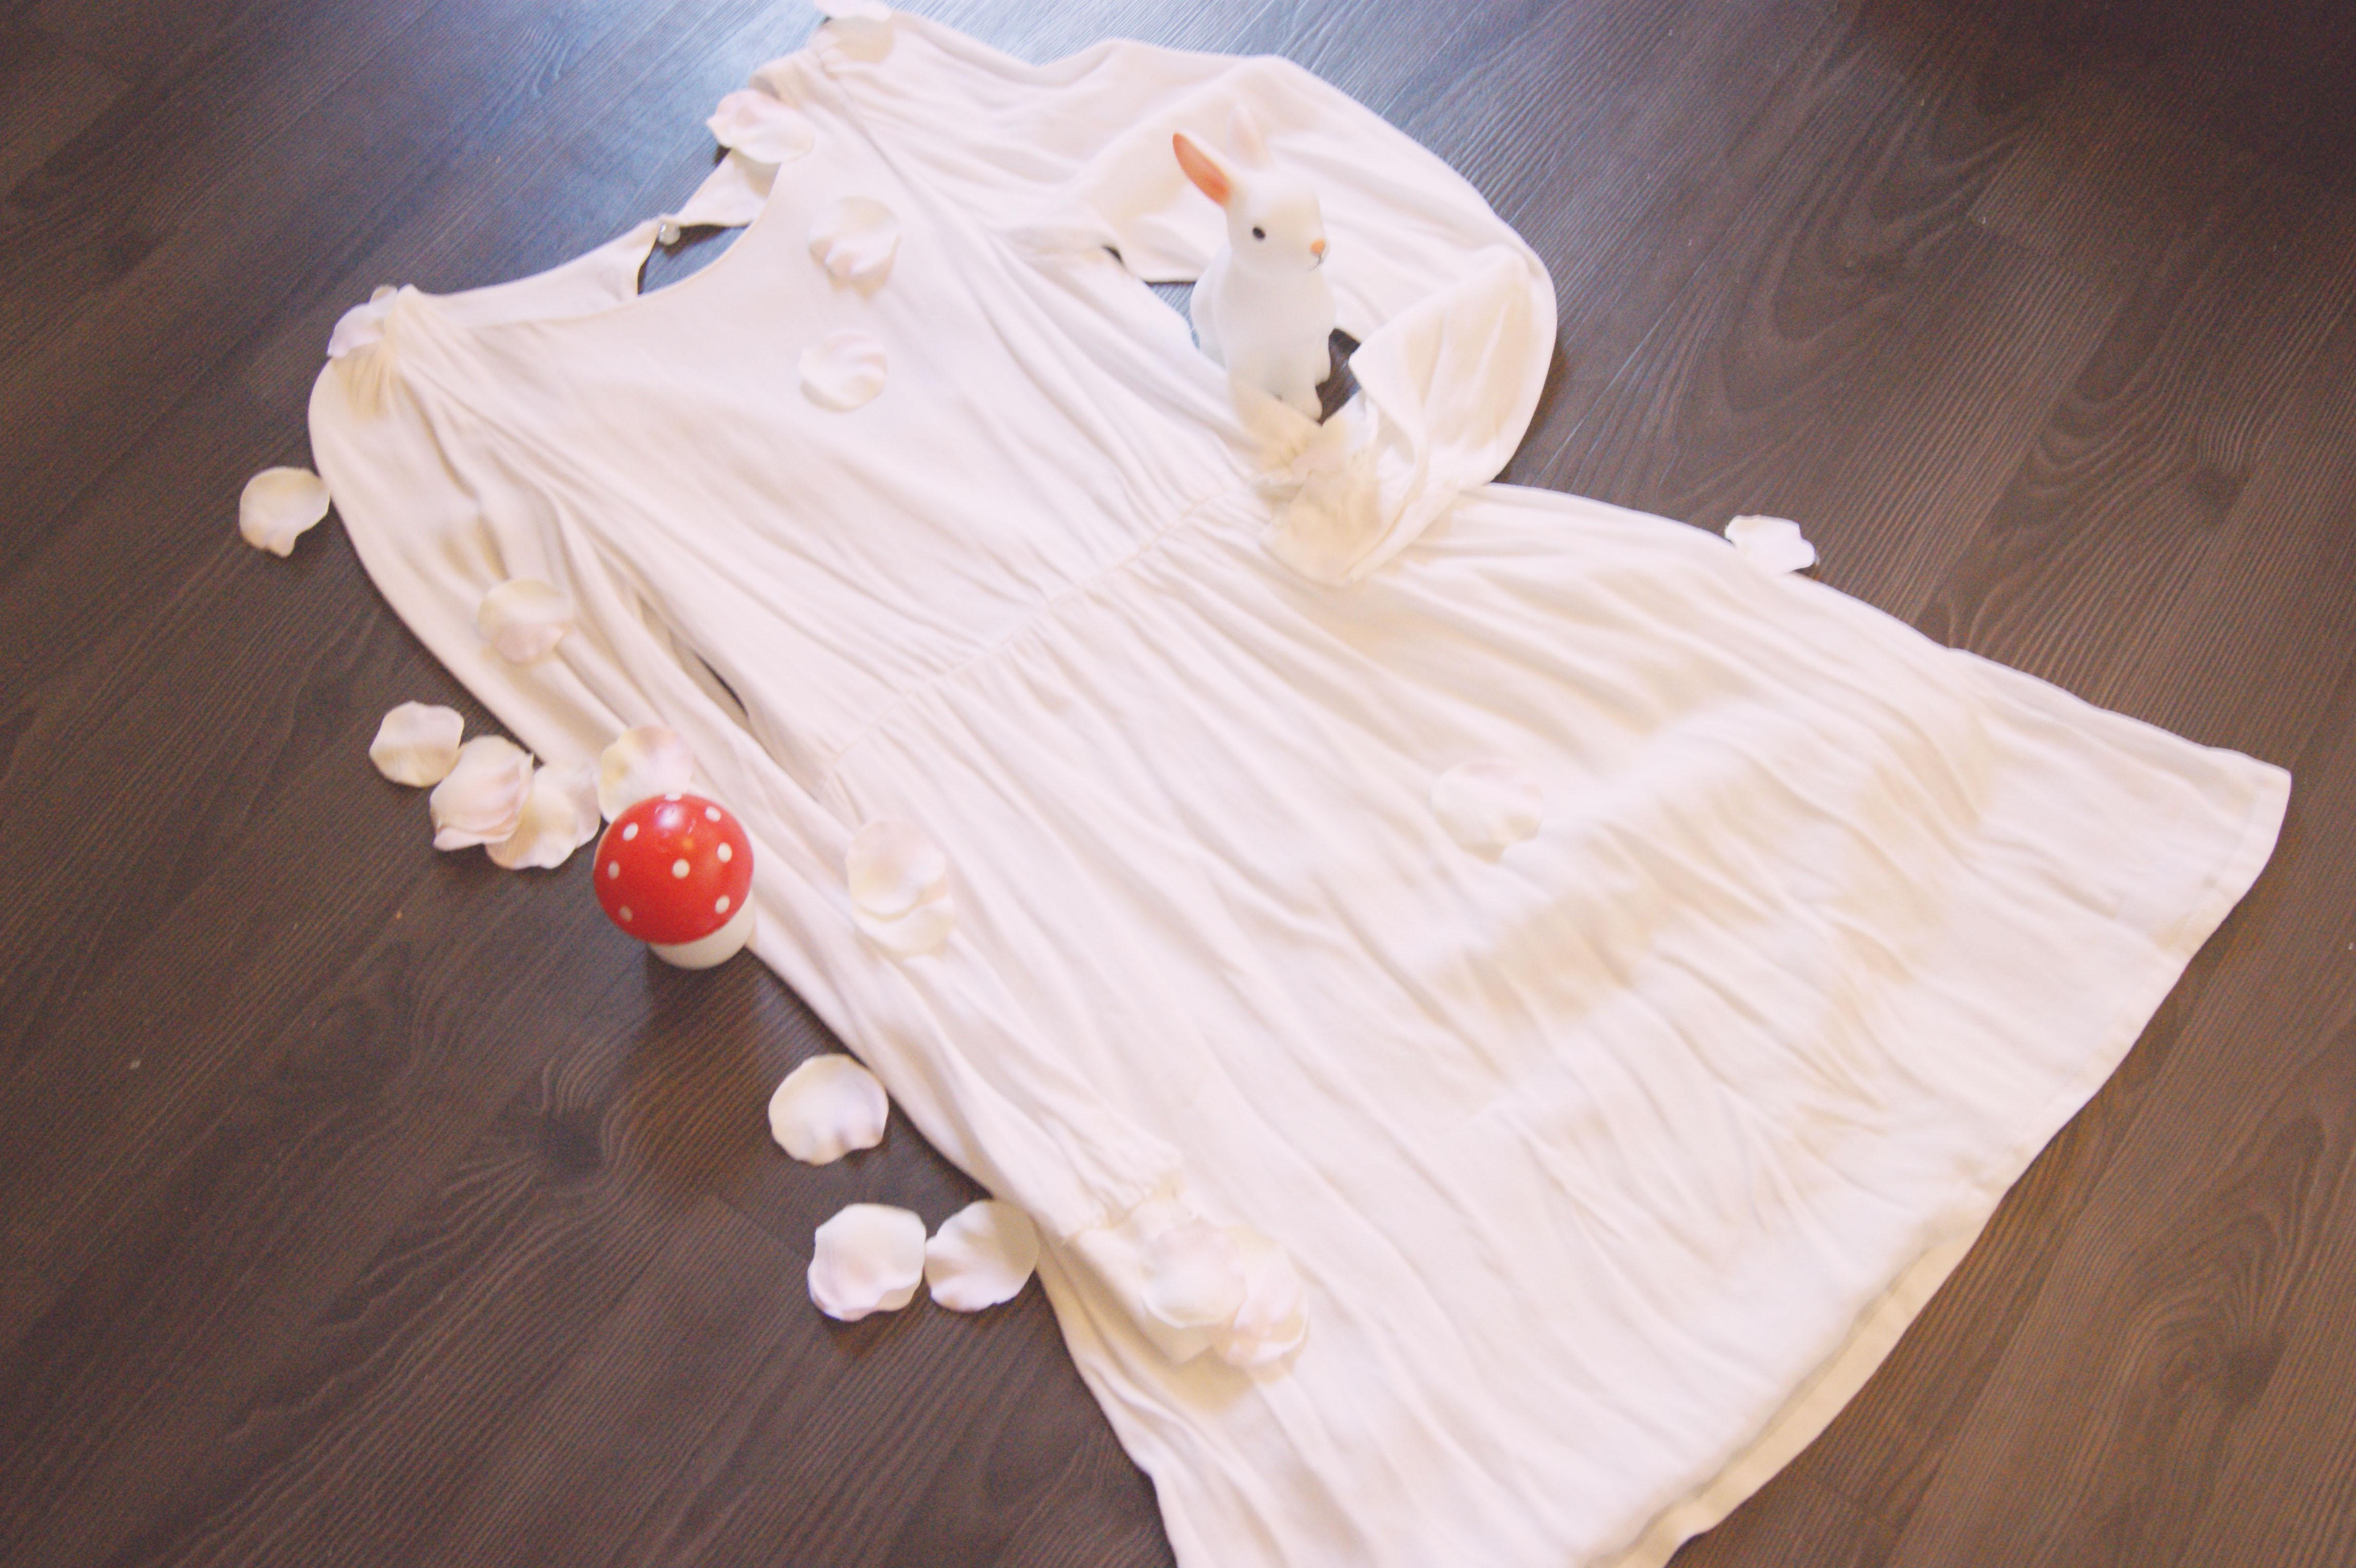 robe kate flolove paris my little wedding